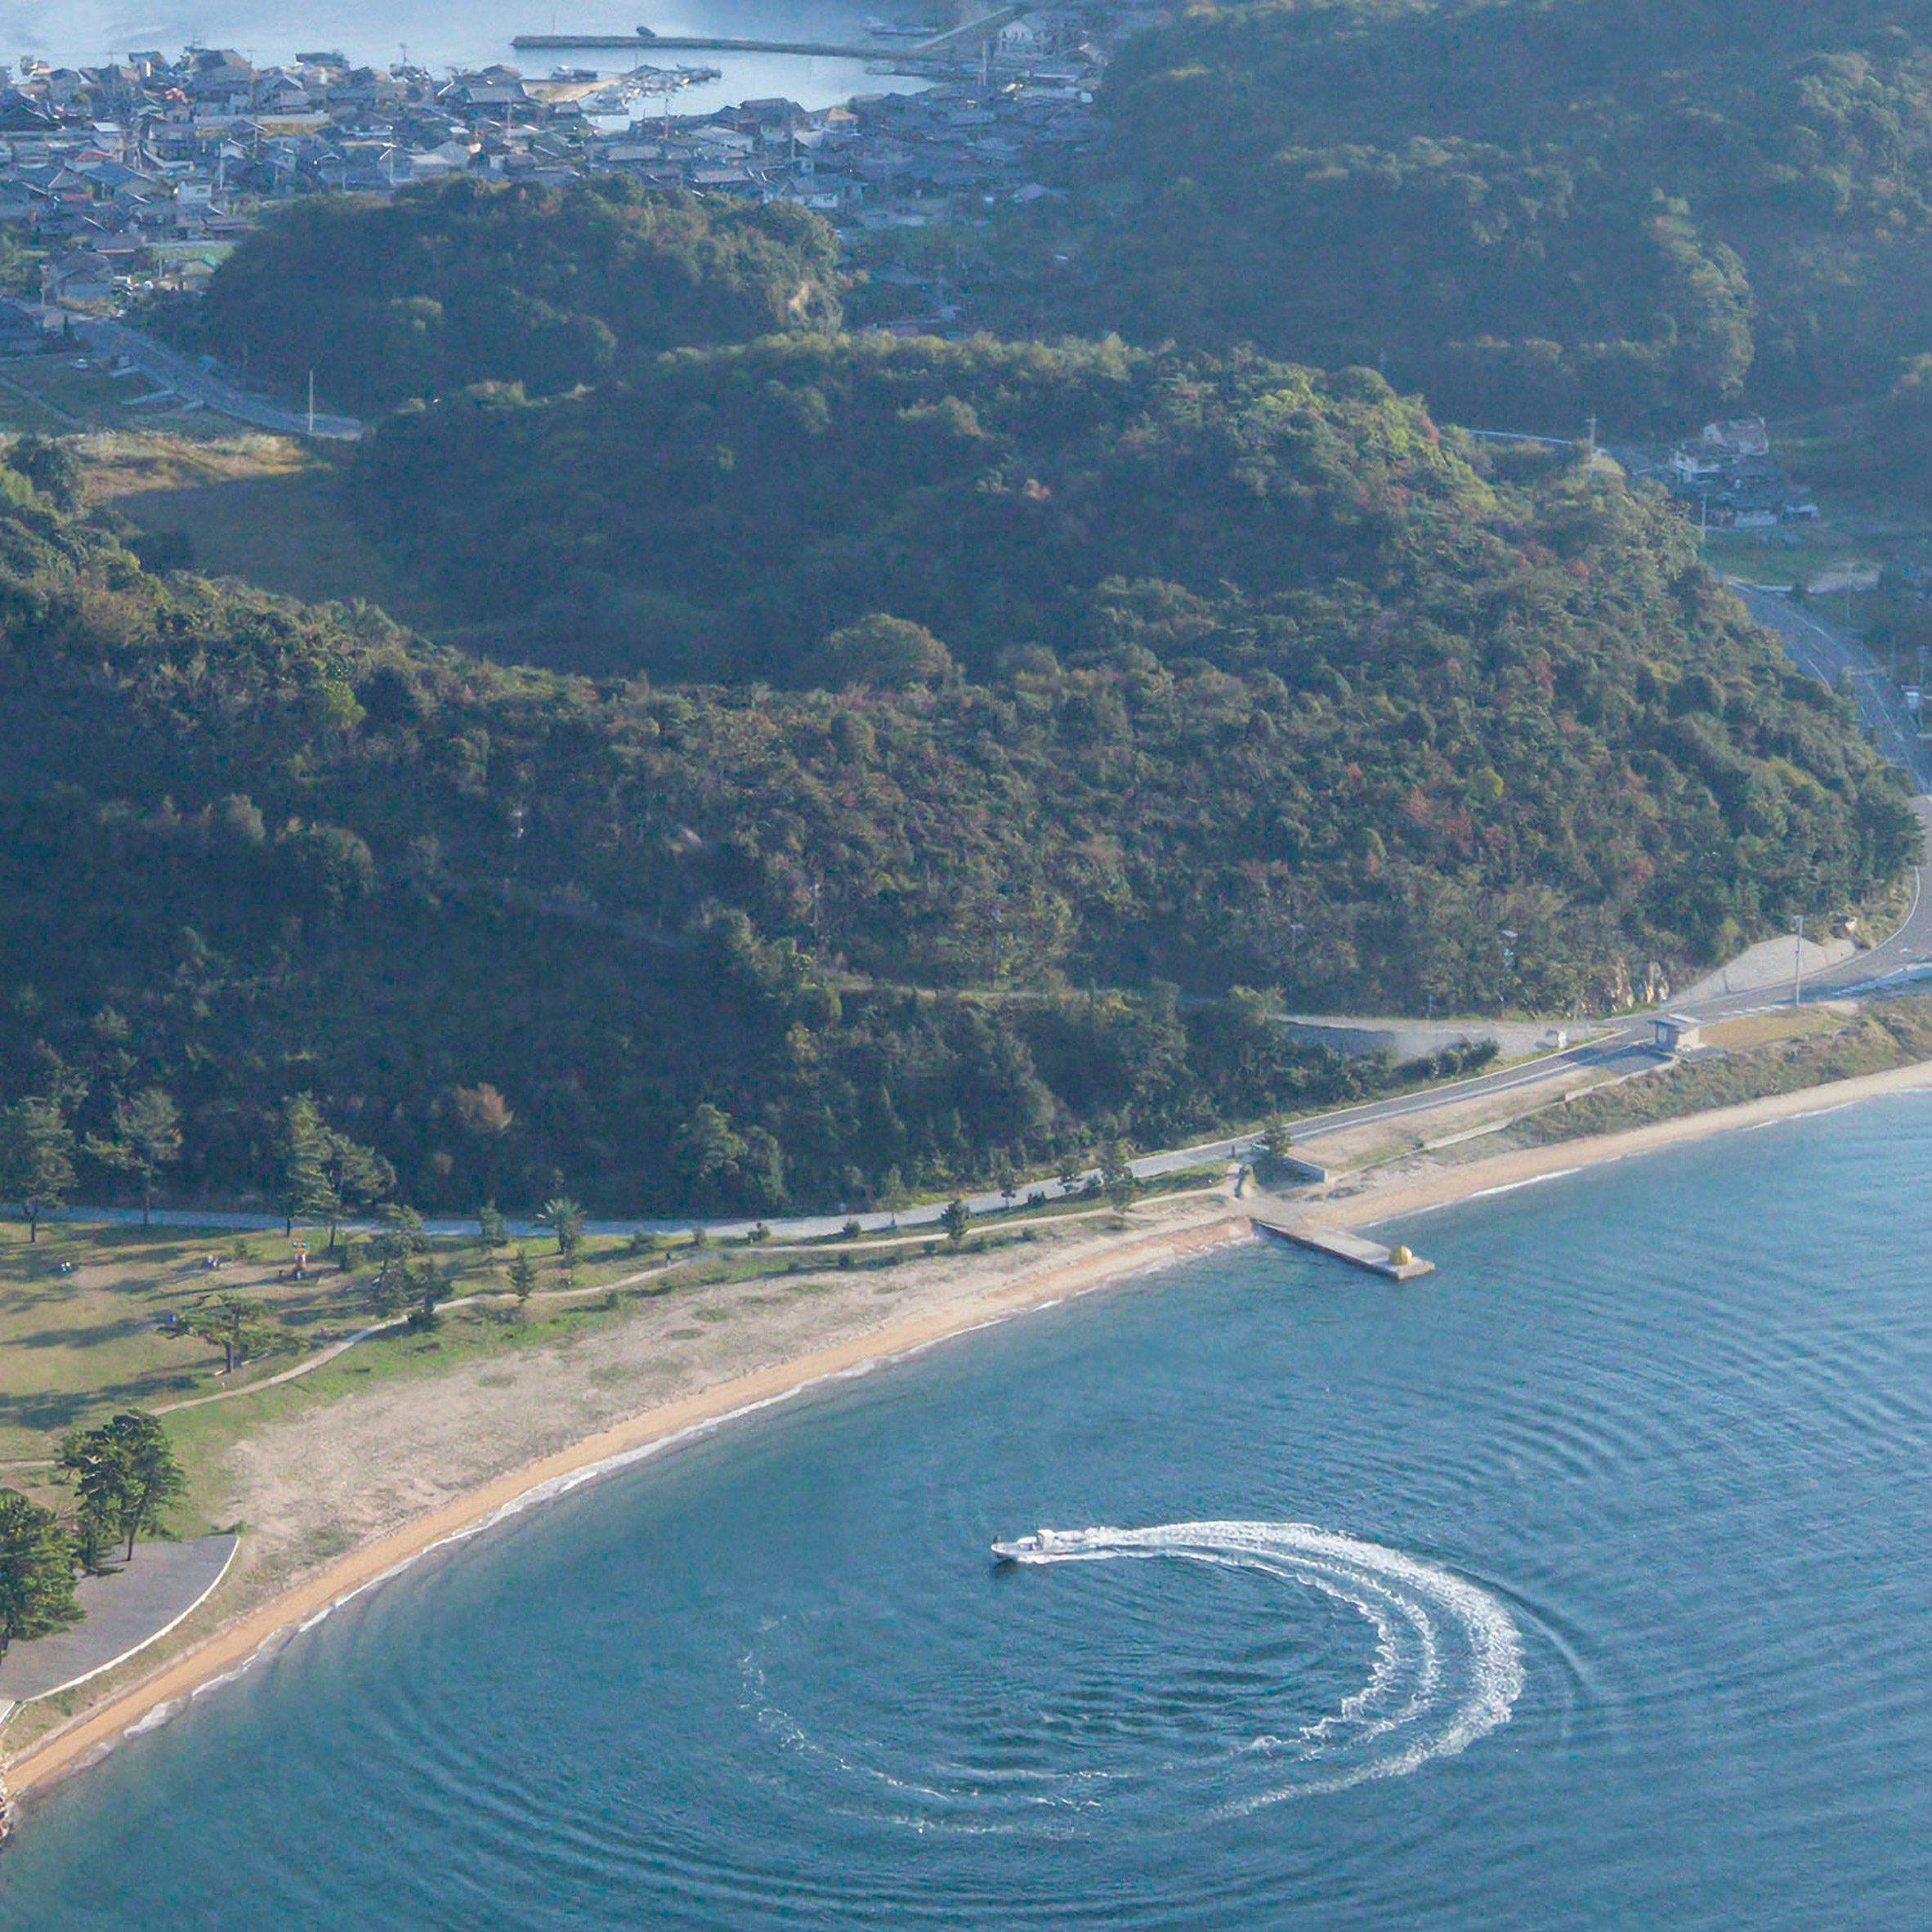 An aerial photo of Naoshima Island showing Kusama's pumpkin sculpture on a pier